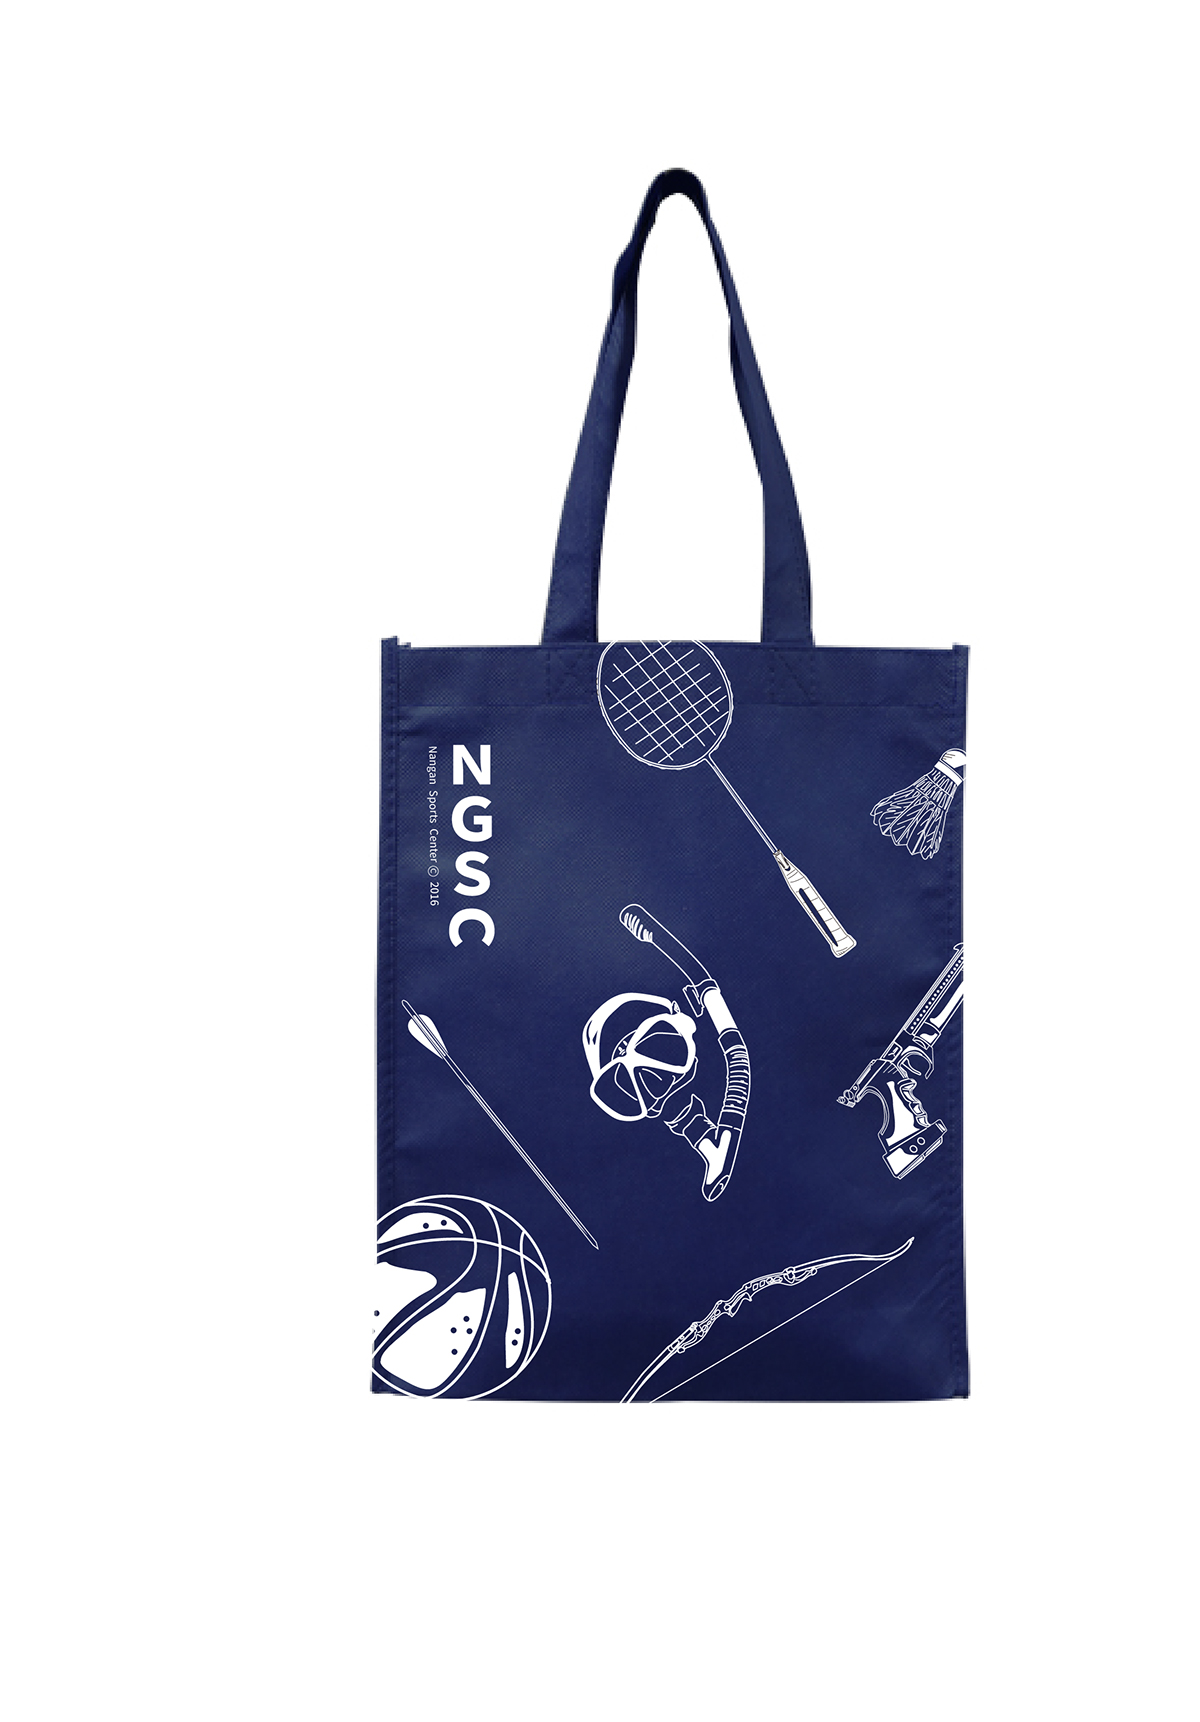 Bag Design_南港運動中心提袋設計提案-捷可印